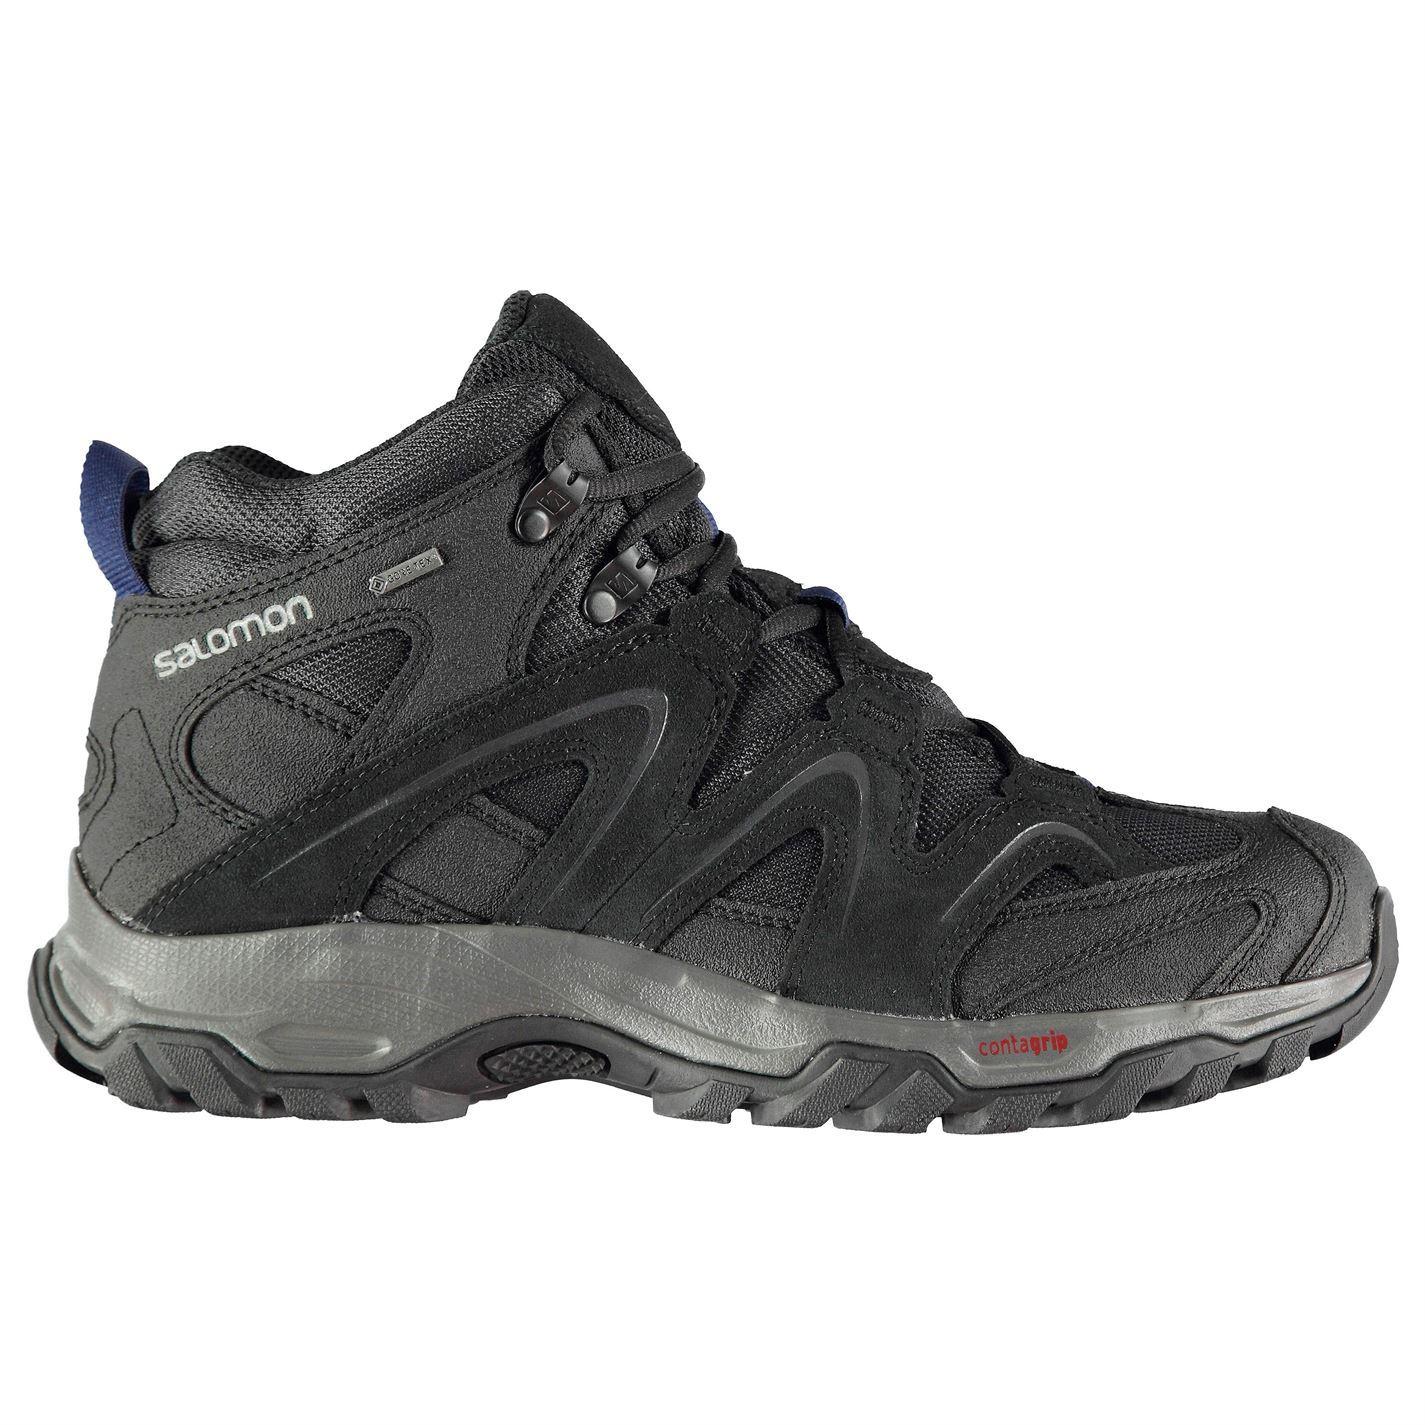 6f6119a833da5 Details about Salomon Vandon Gore-Tex Mid Walking Boots Mens Black Hiking  Trekking Shoes